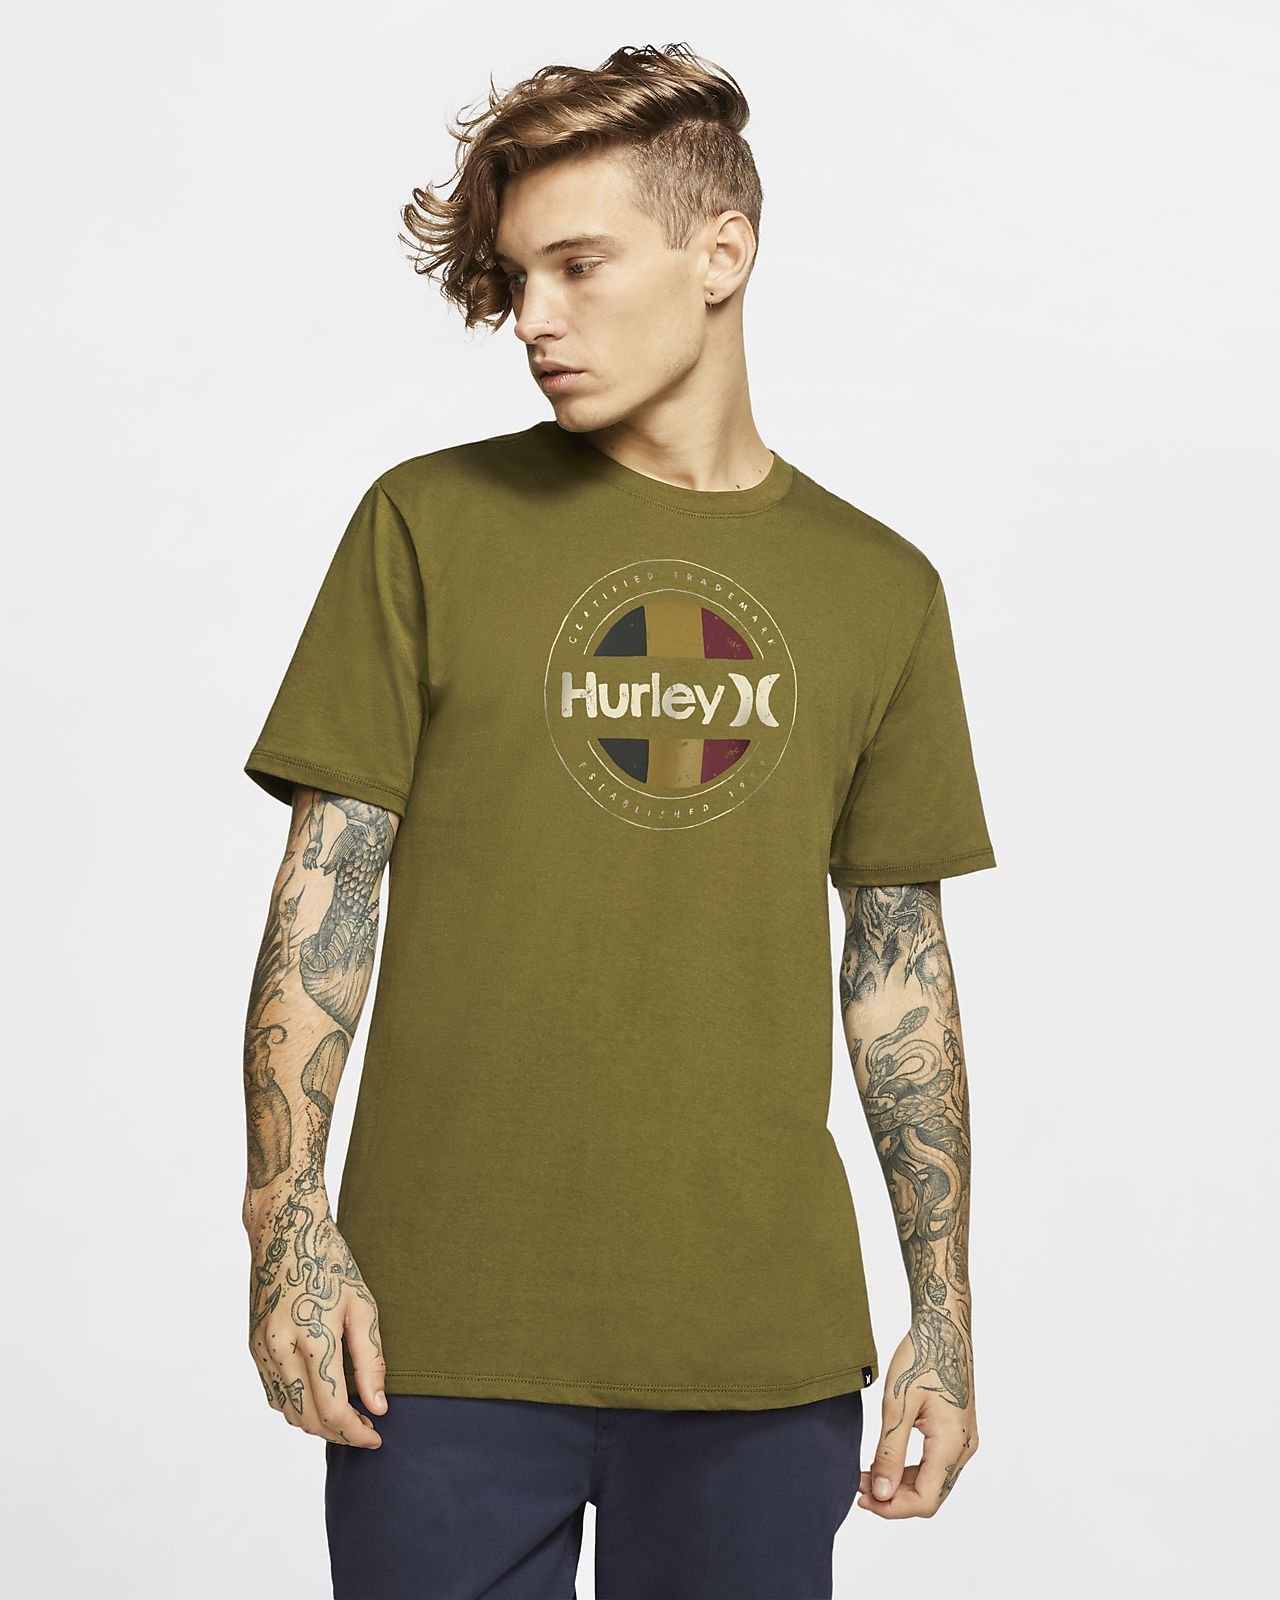 Tee-shirt coupe Premium Hurley Premium Resistance pour Homme